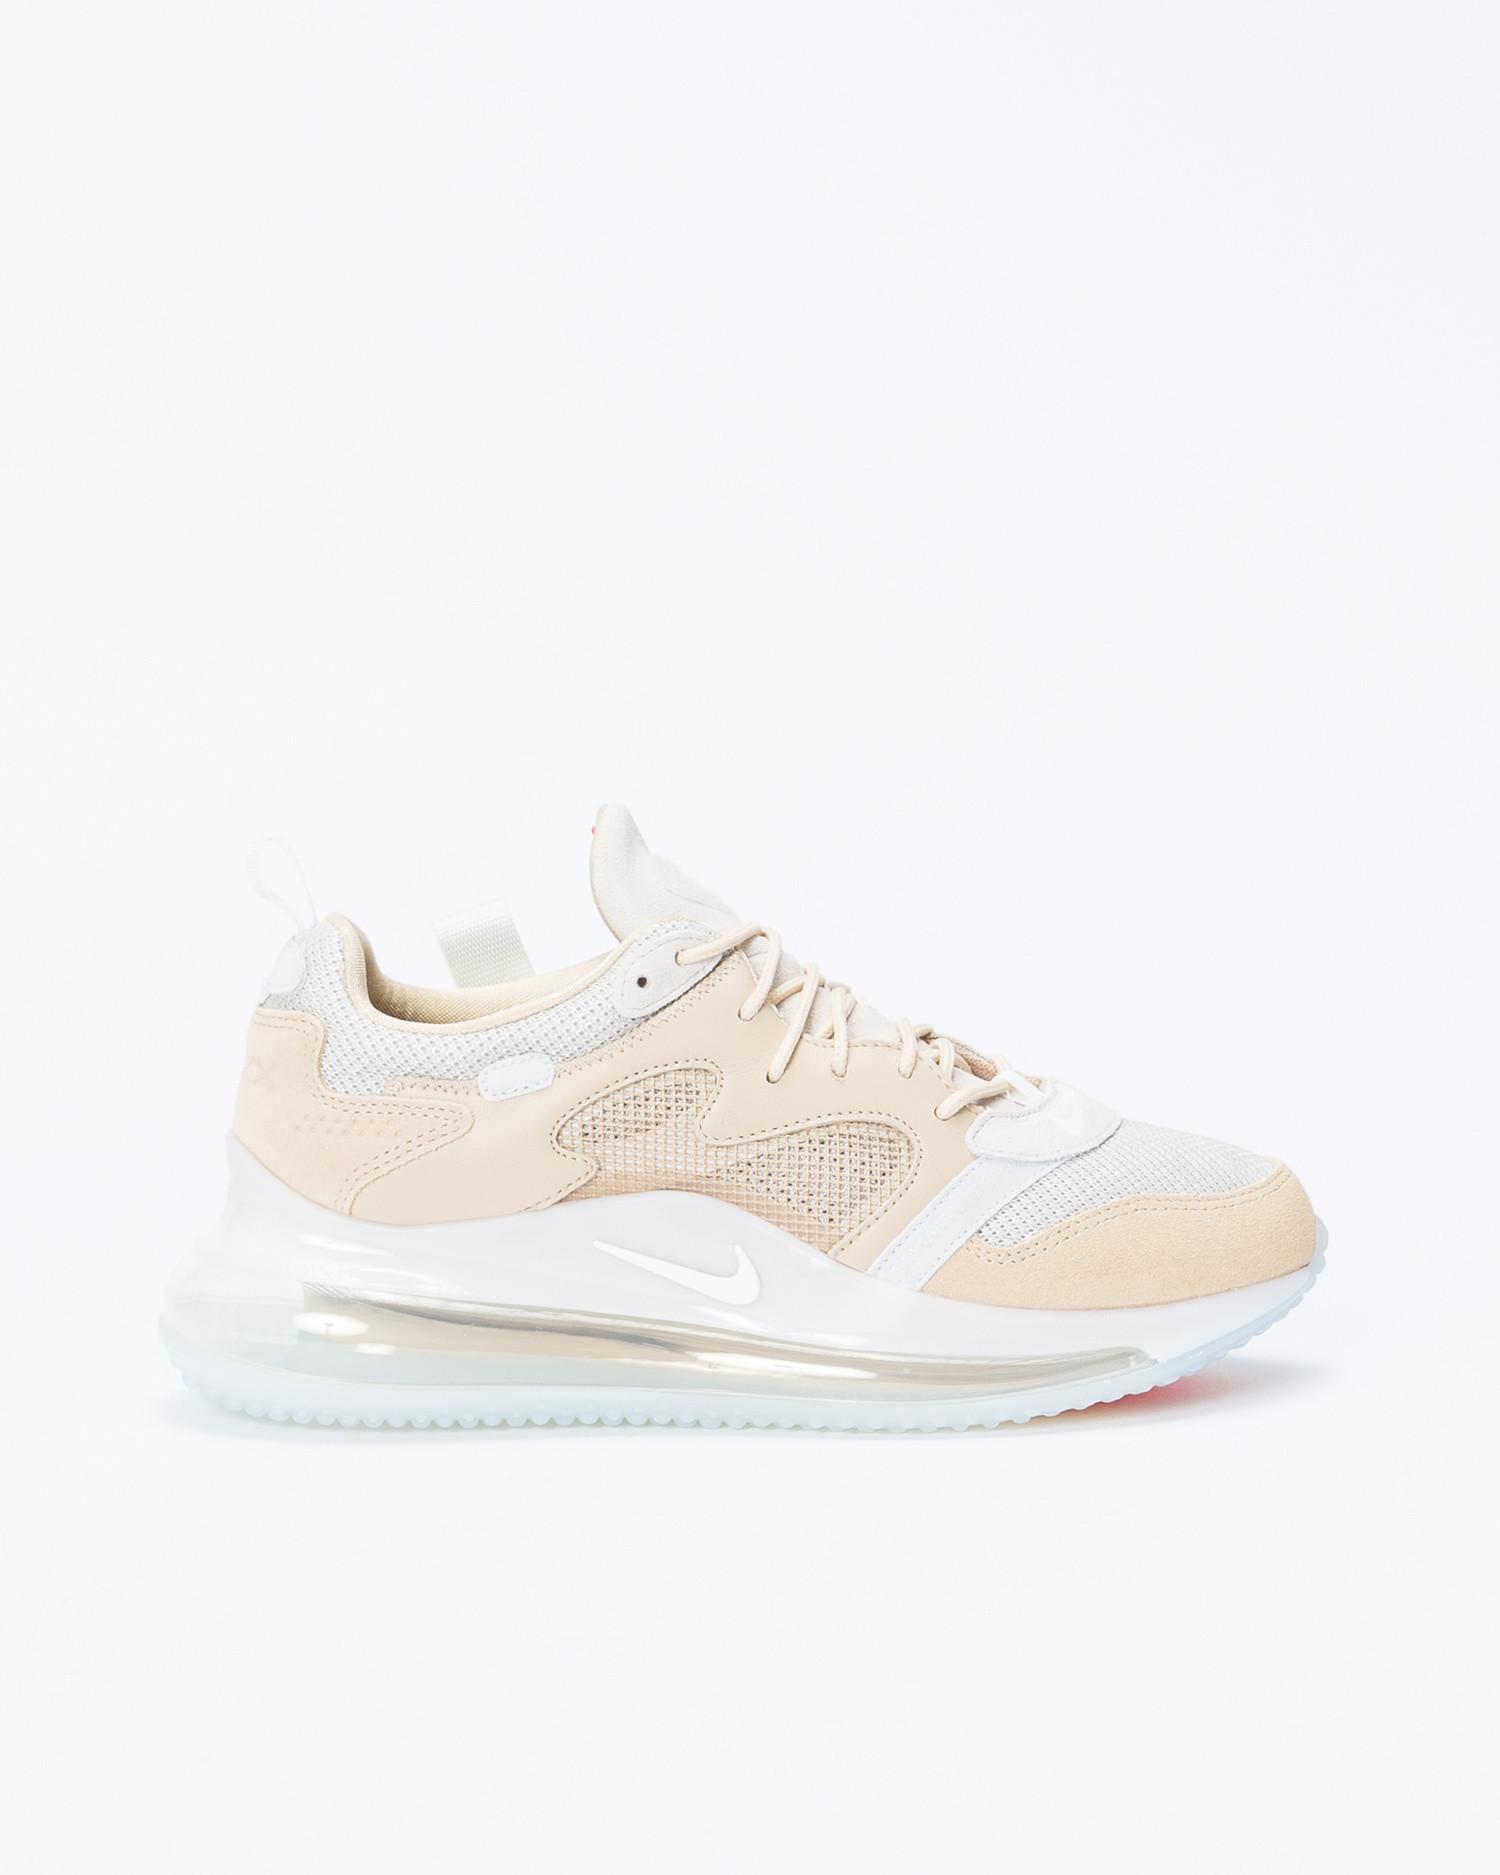 Nike Air Max 720/obj Desert Ore/Light Bone-Summit White